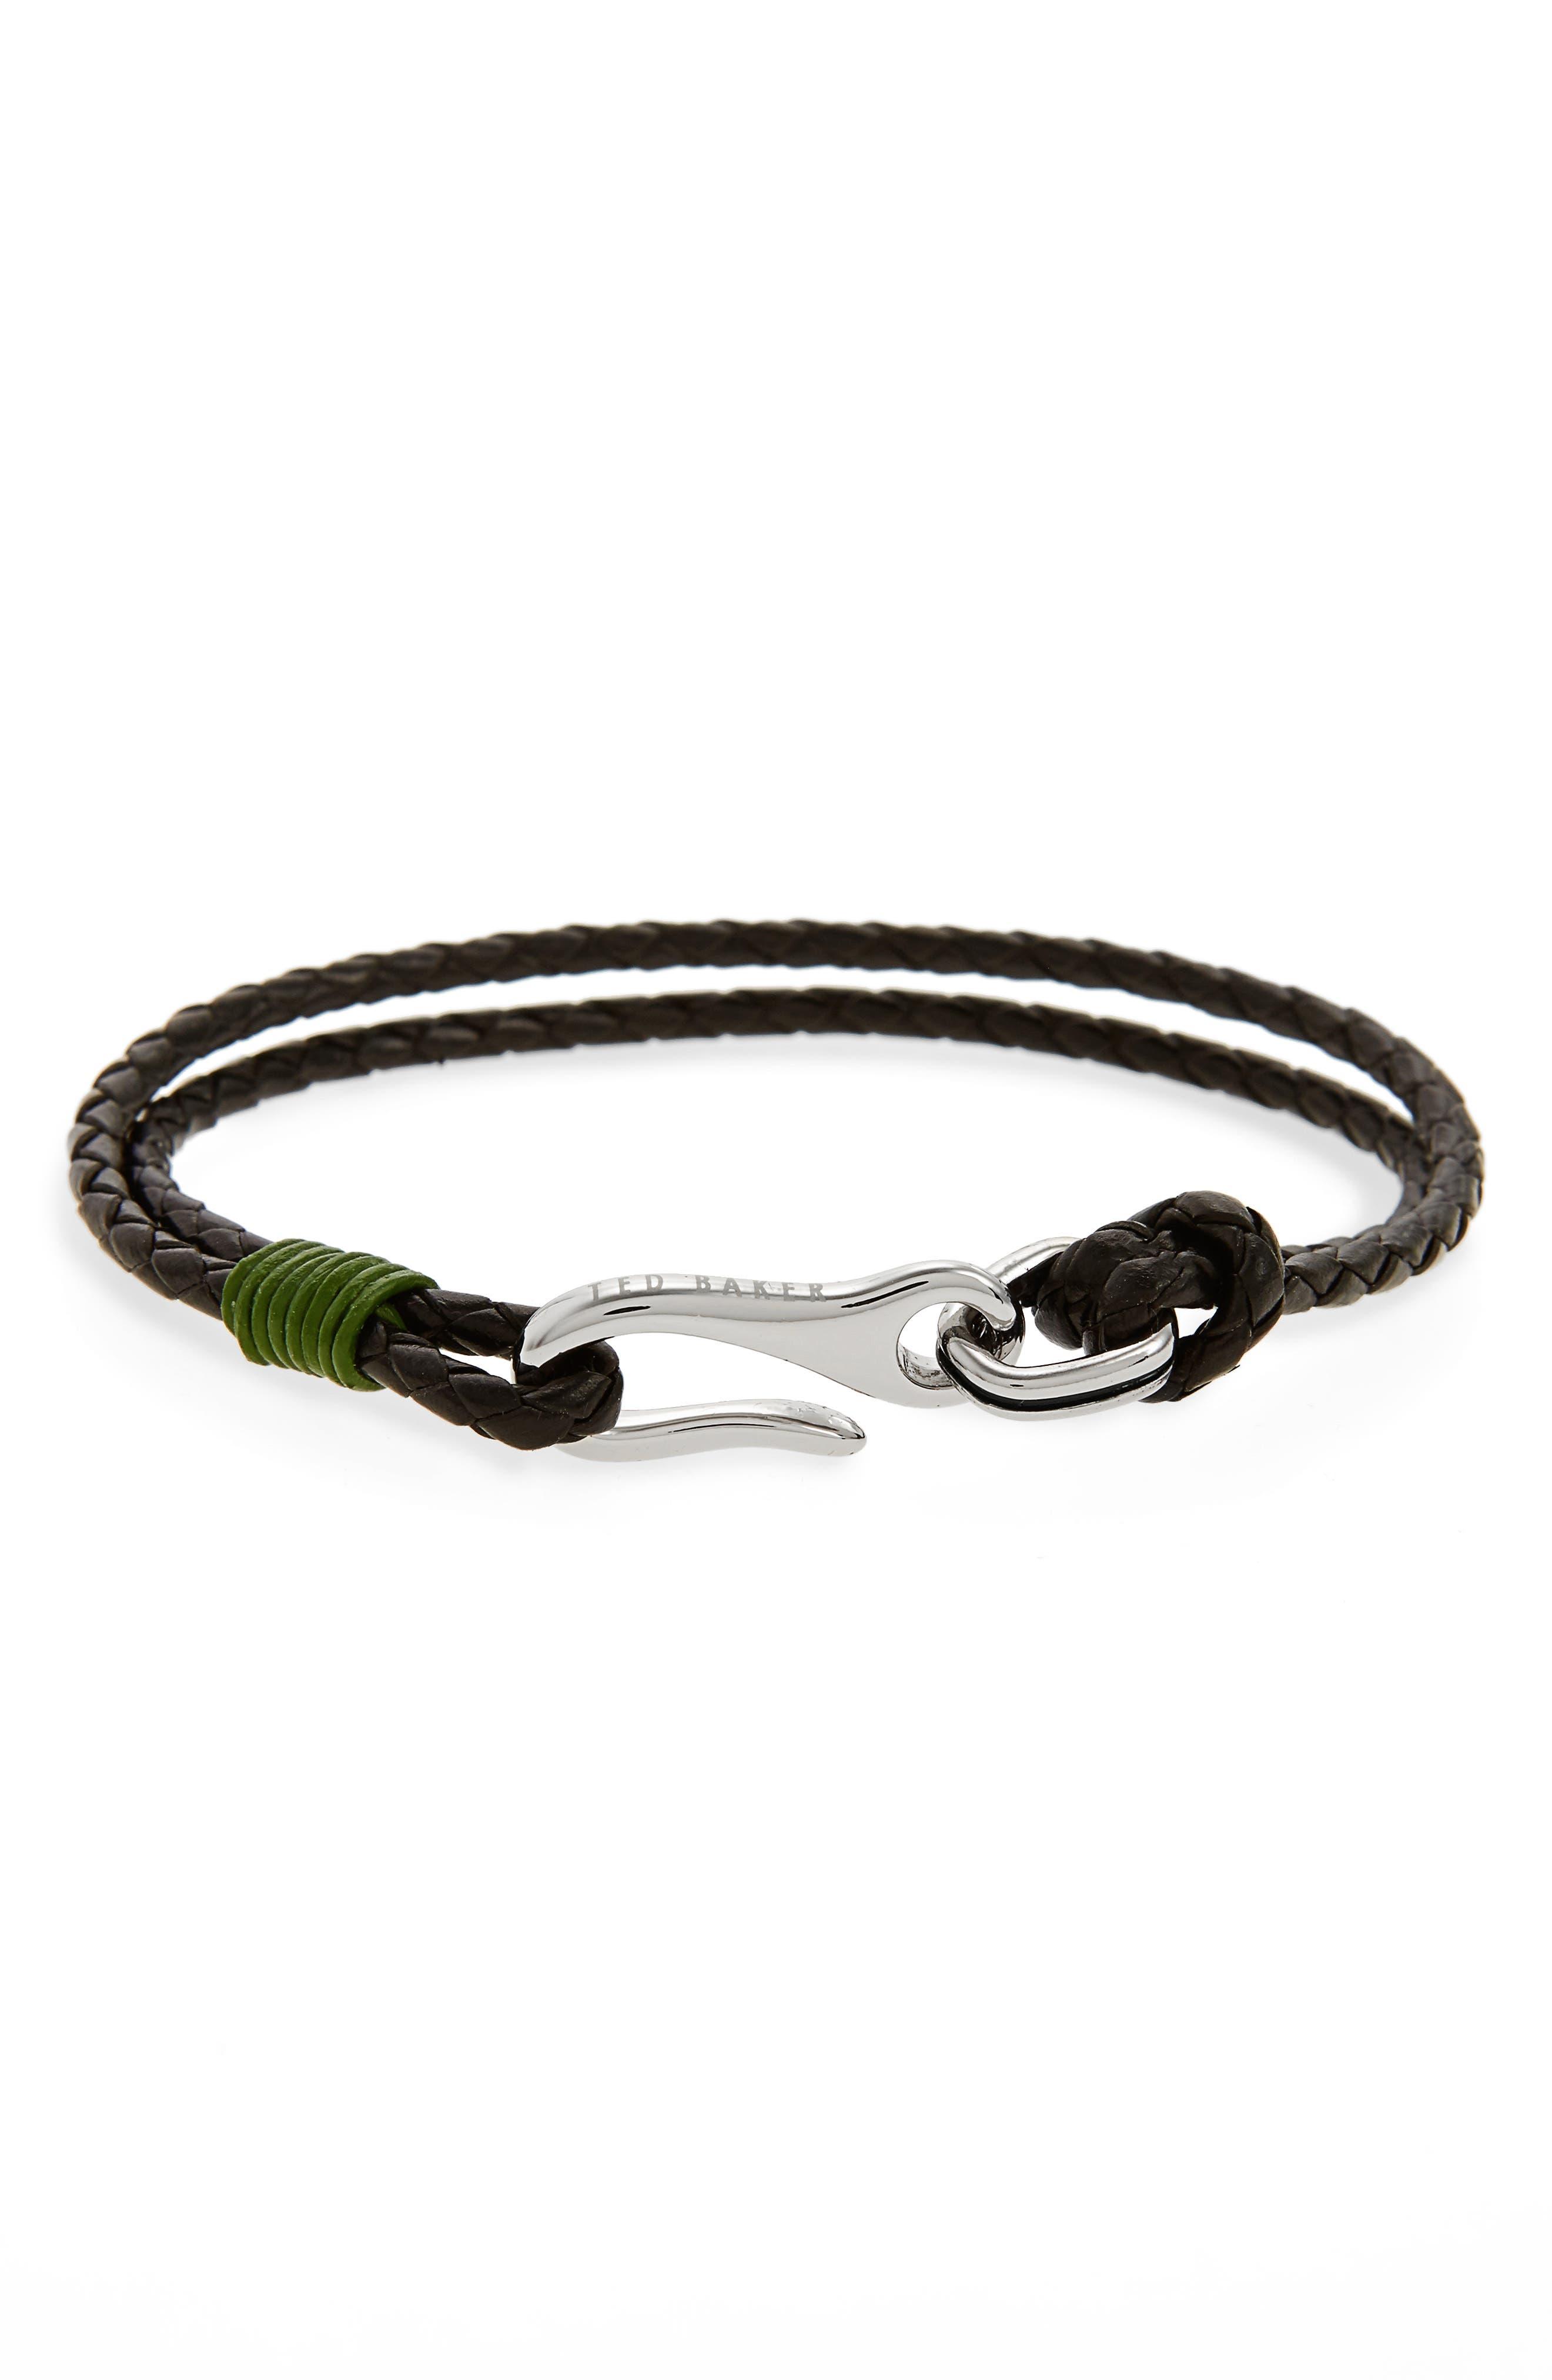 Ted Baker London Twirl Braided Leather Bracelet